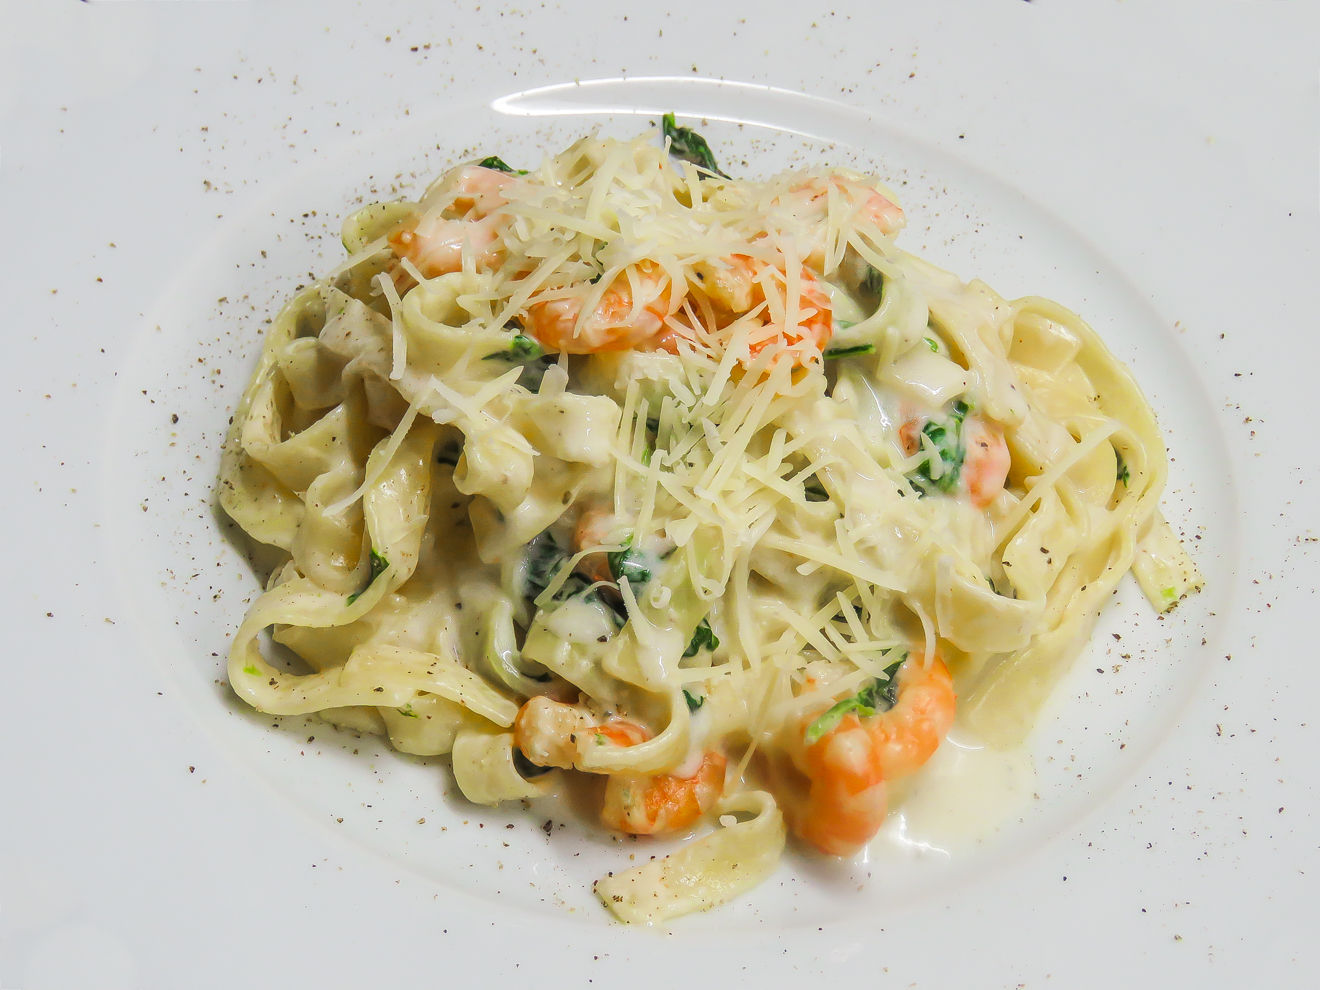 Креветки со спагетти в сливочном соусе рецепт пошагово